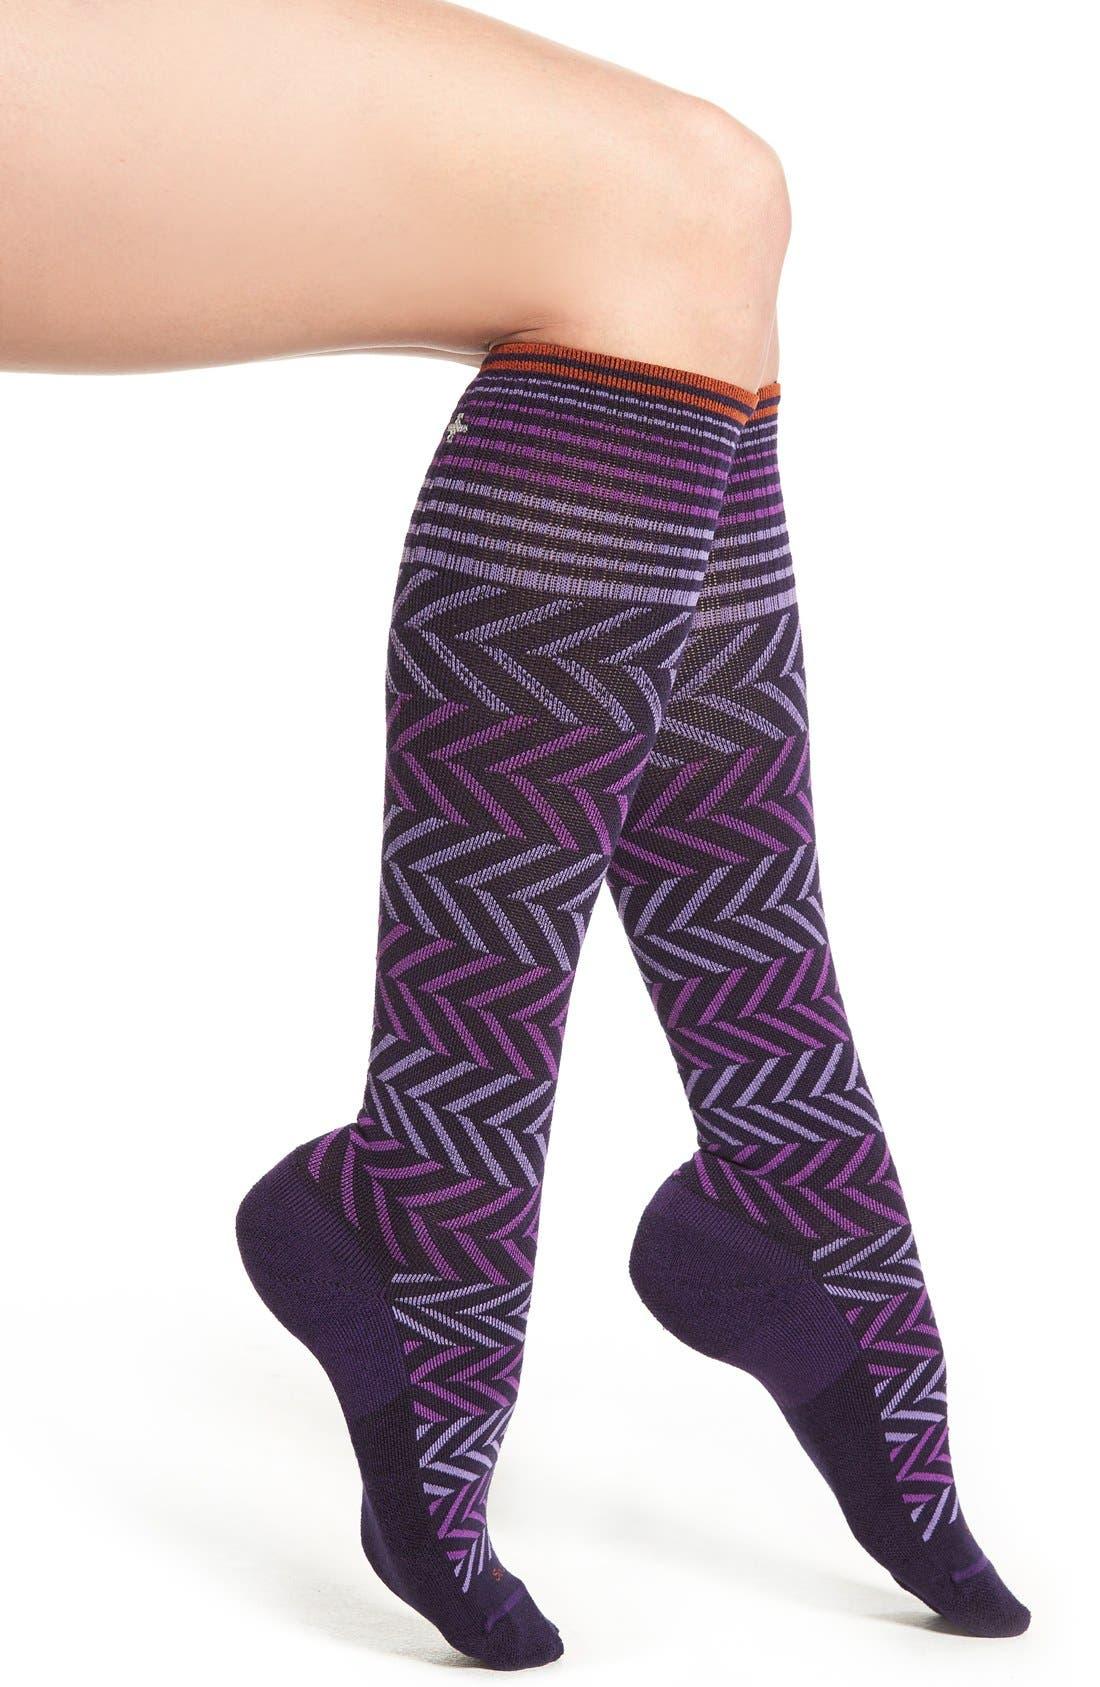 Main Image - Sockwell Goodhew Graduated Compression Socks